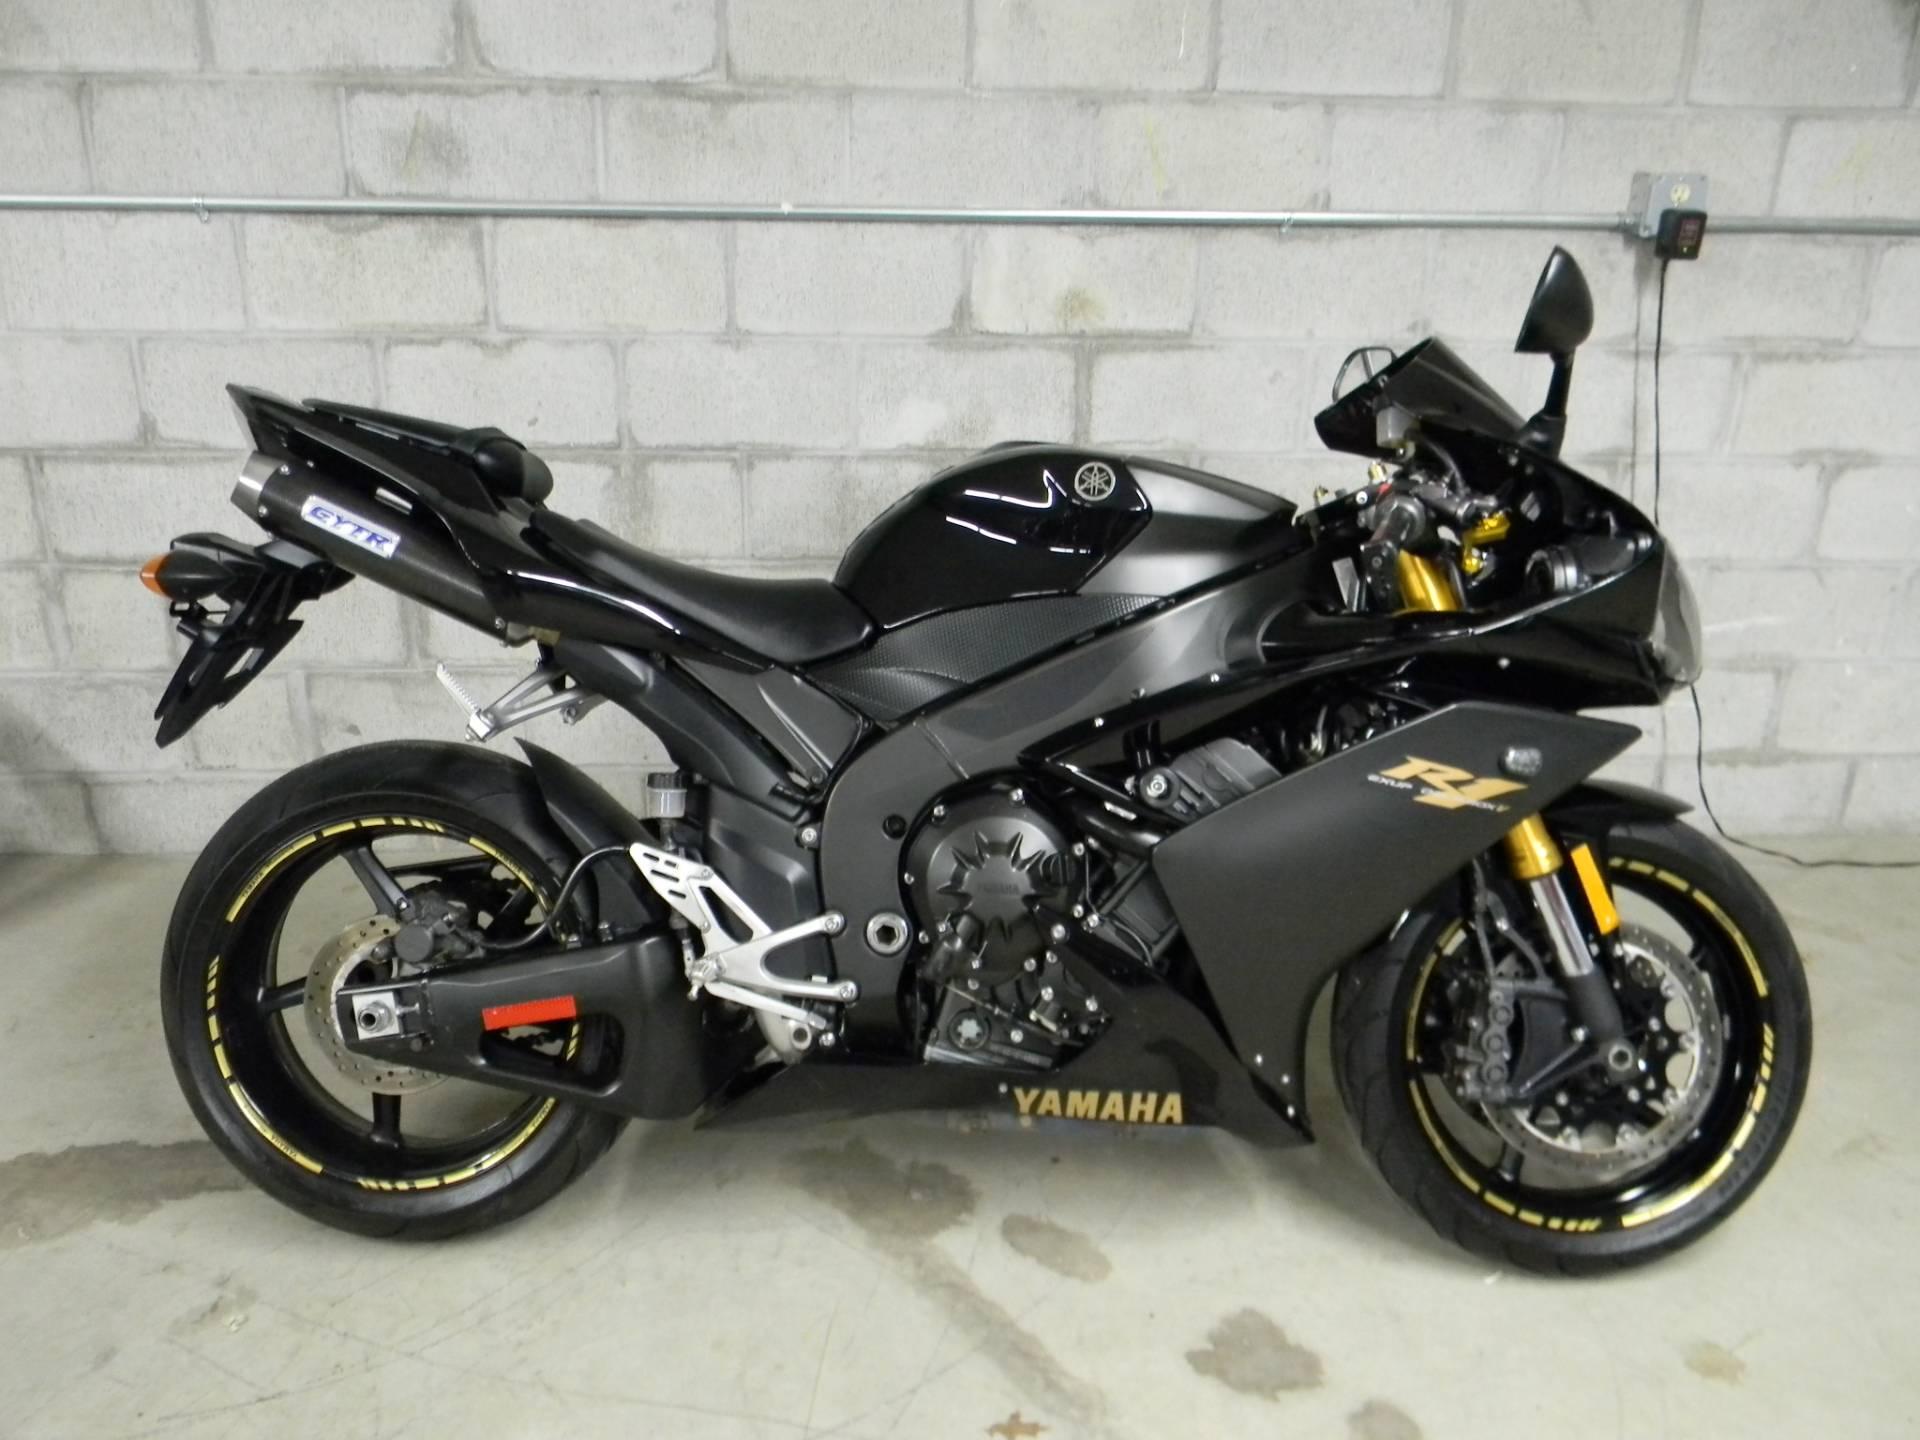 2008 Yamaha YZF-R1 for sale 129540